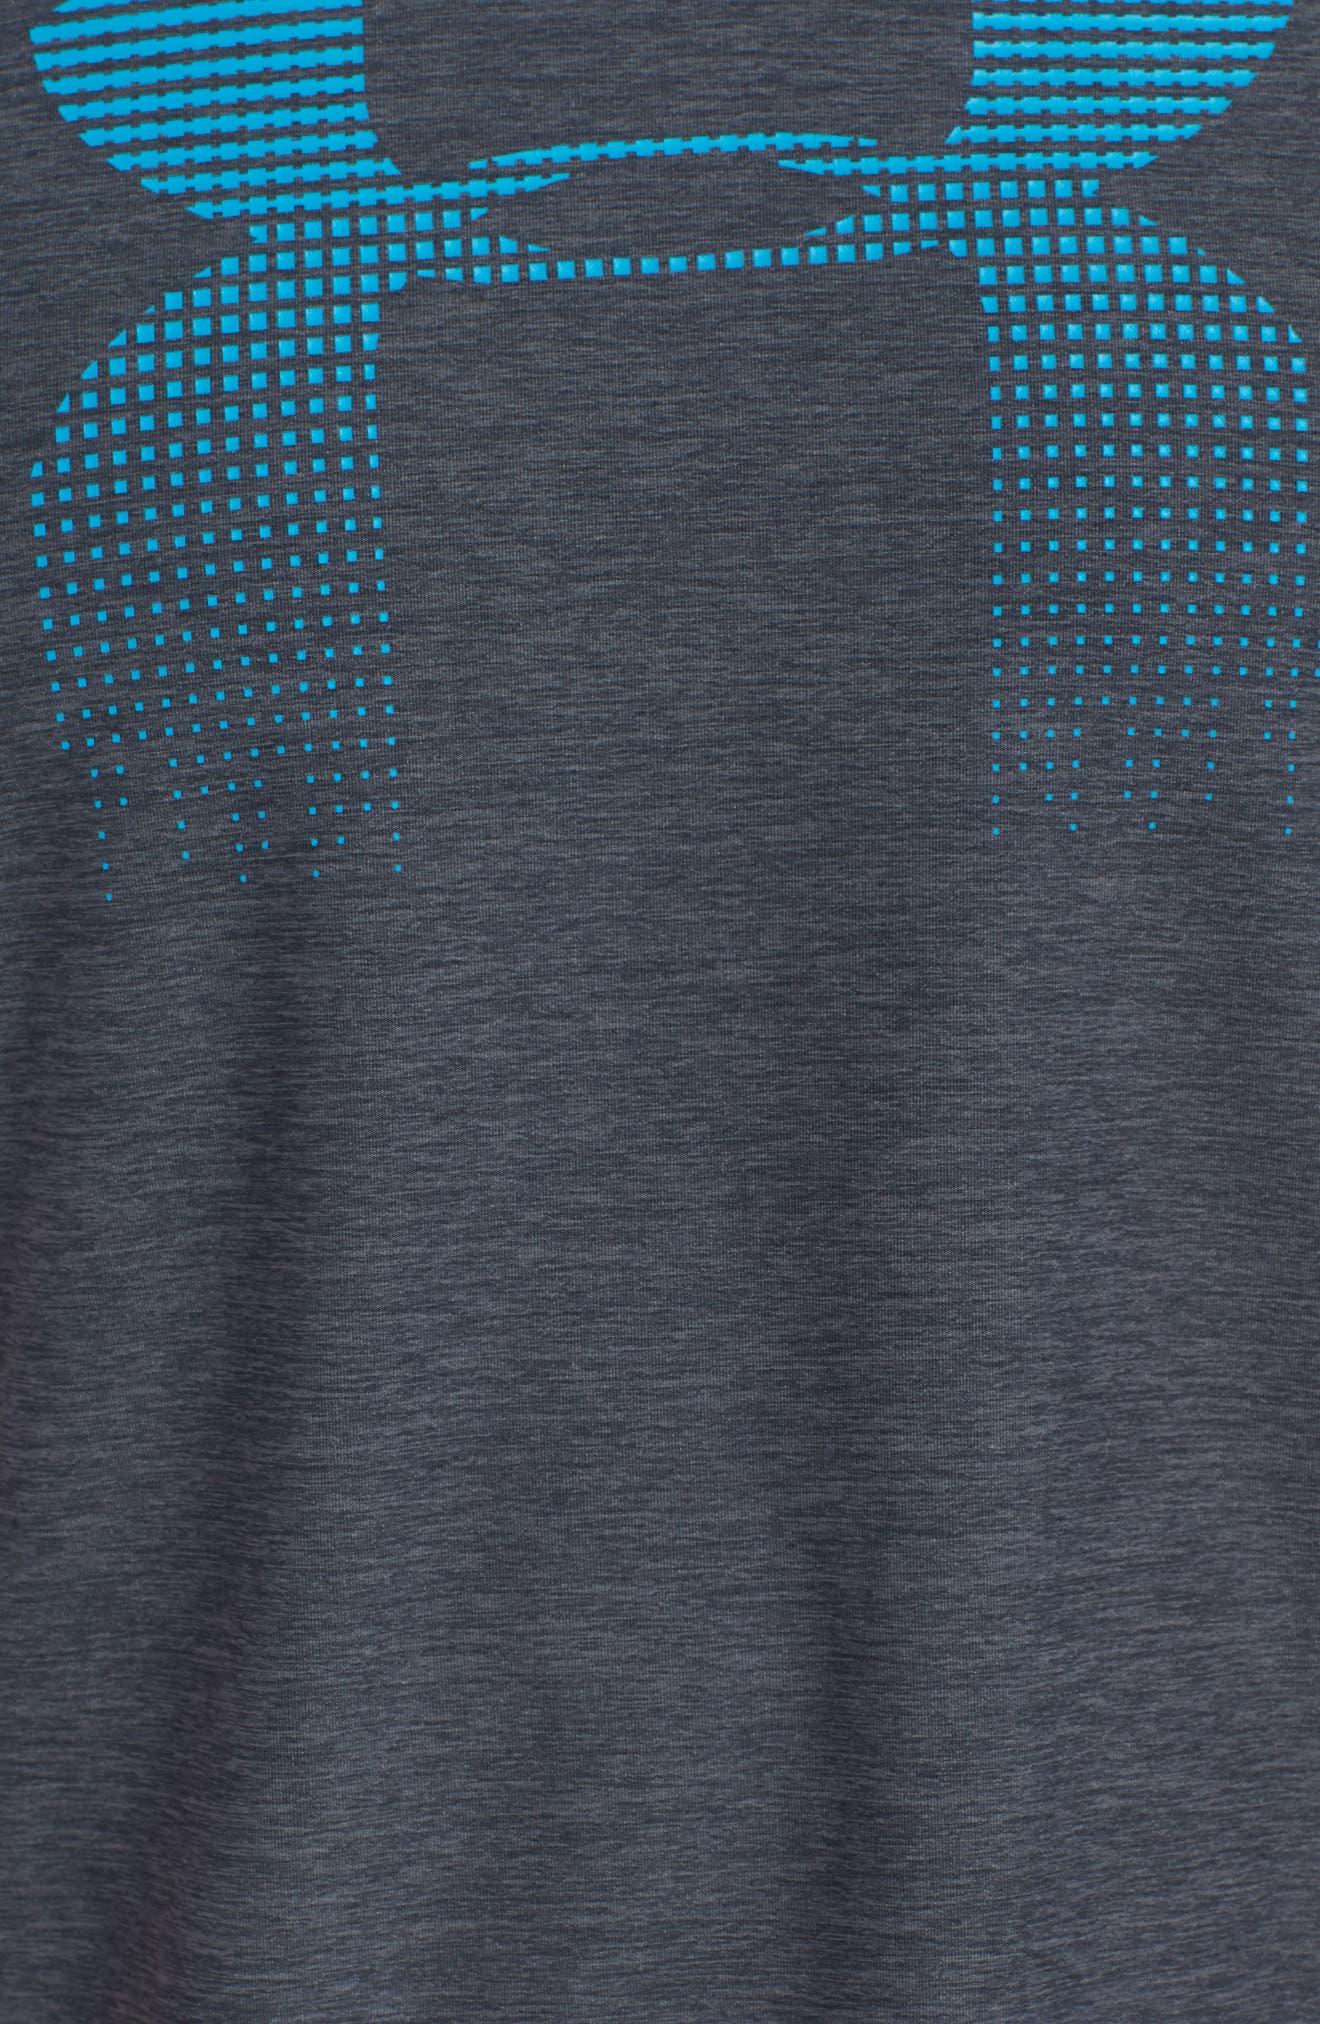 Raid Graphic T-Shirt,                             Alternate thumbnail 5, color,                             Stealth Grey / / Blue Shift